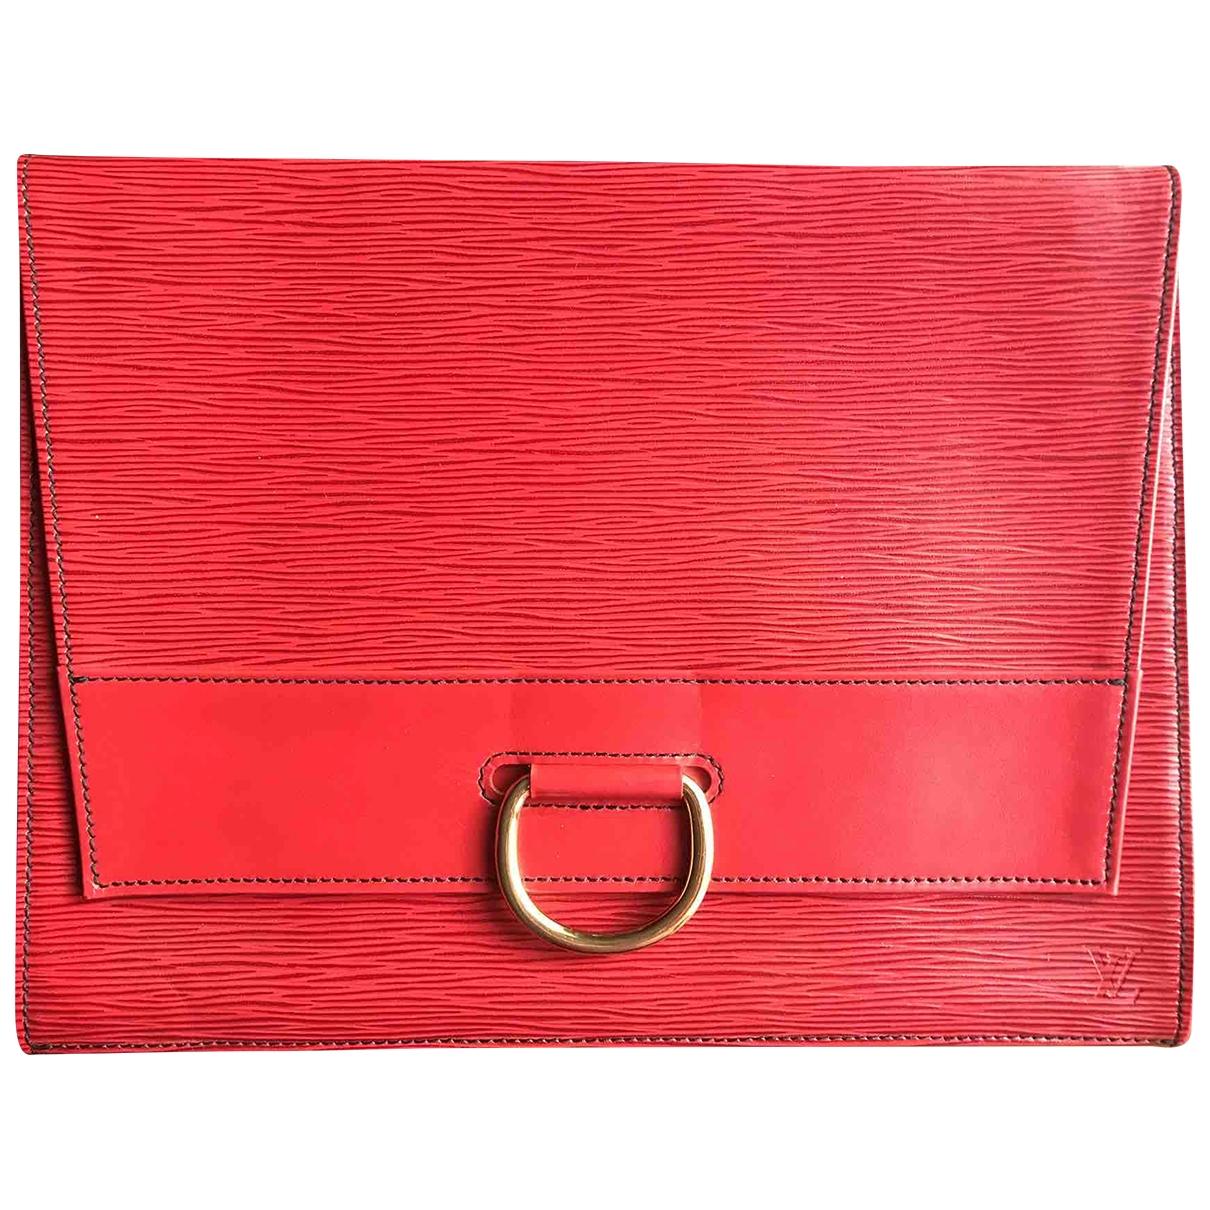 Louis Vuitton \N Clutch in  Rot Leder